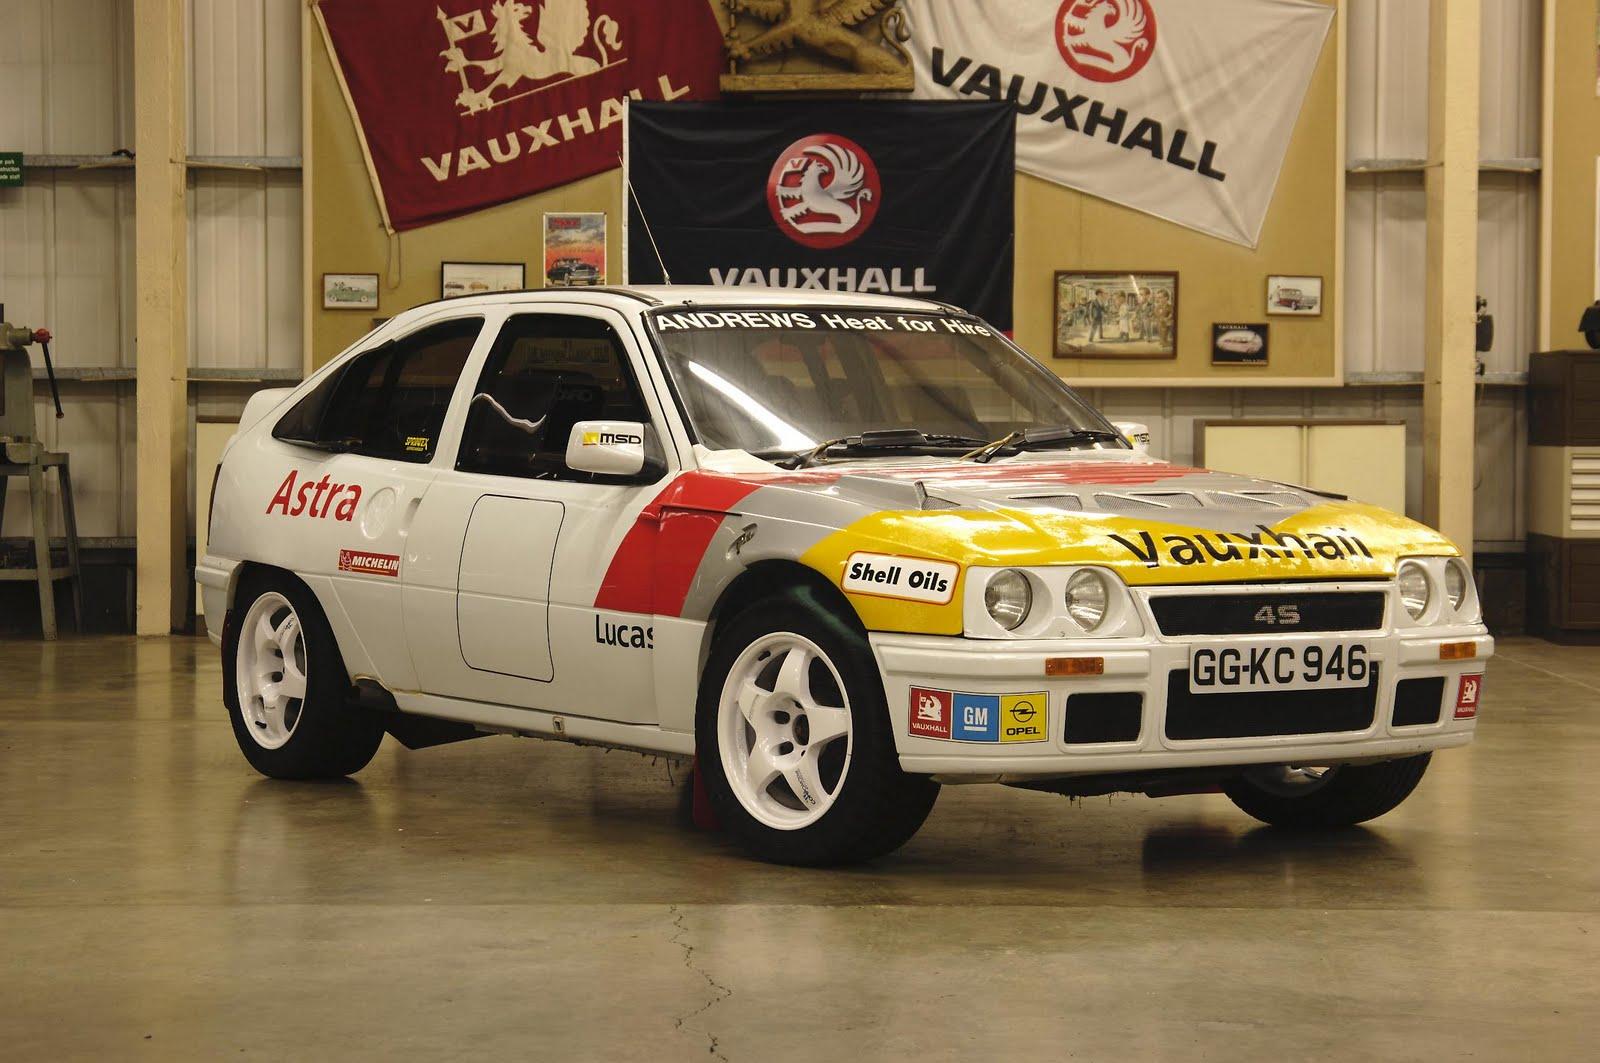 Vauxhall's Astra 4-S Rally car